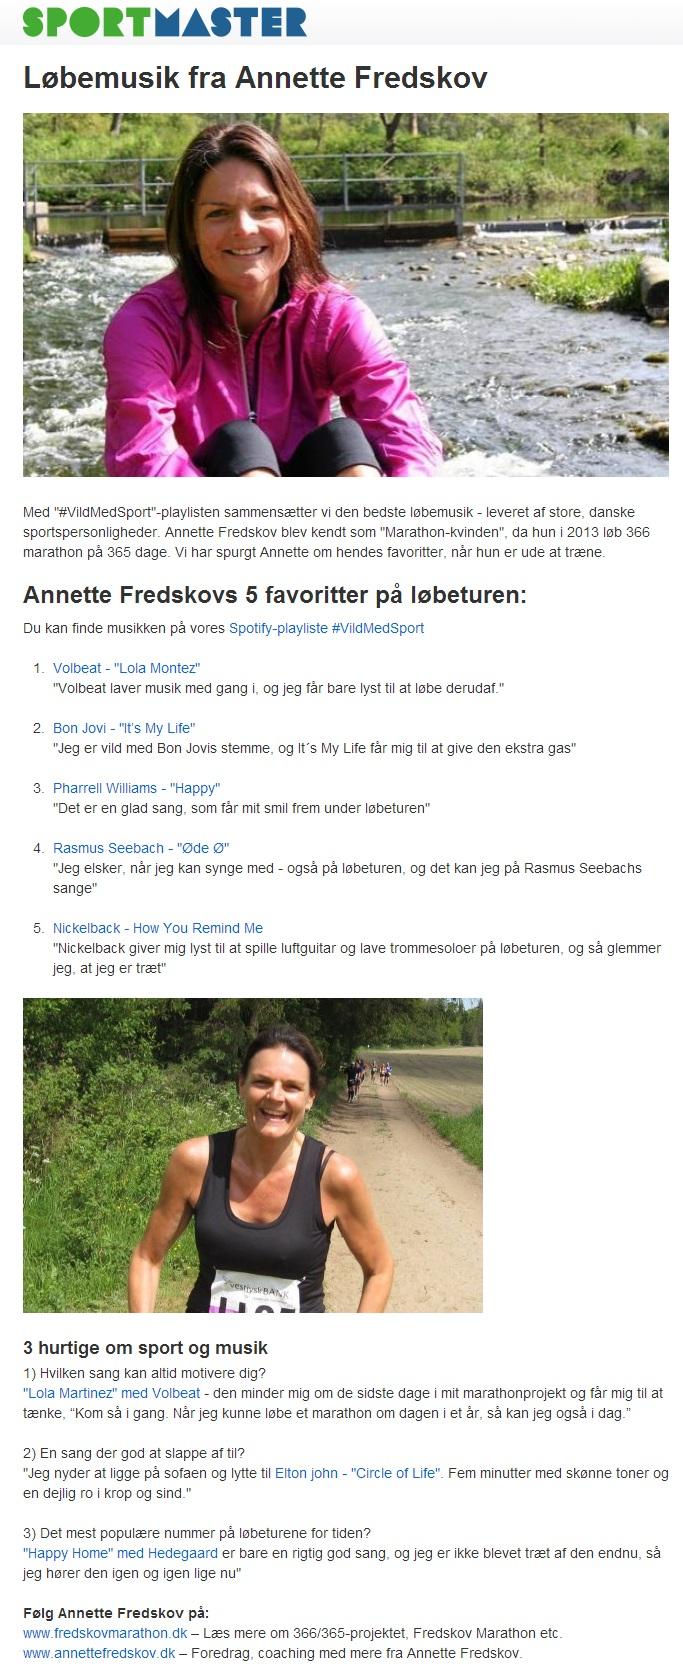 sportmaster.dk 2014.05